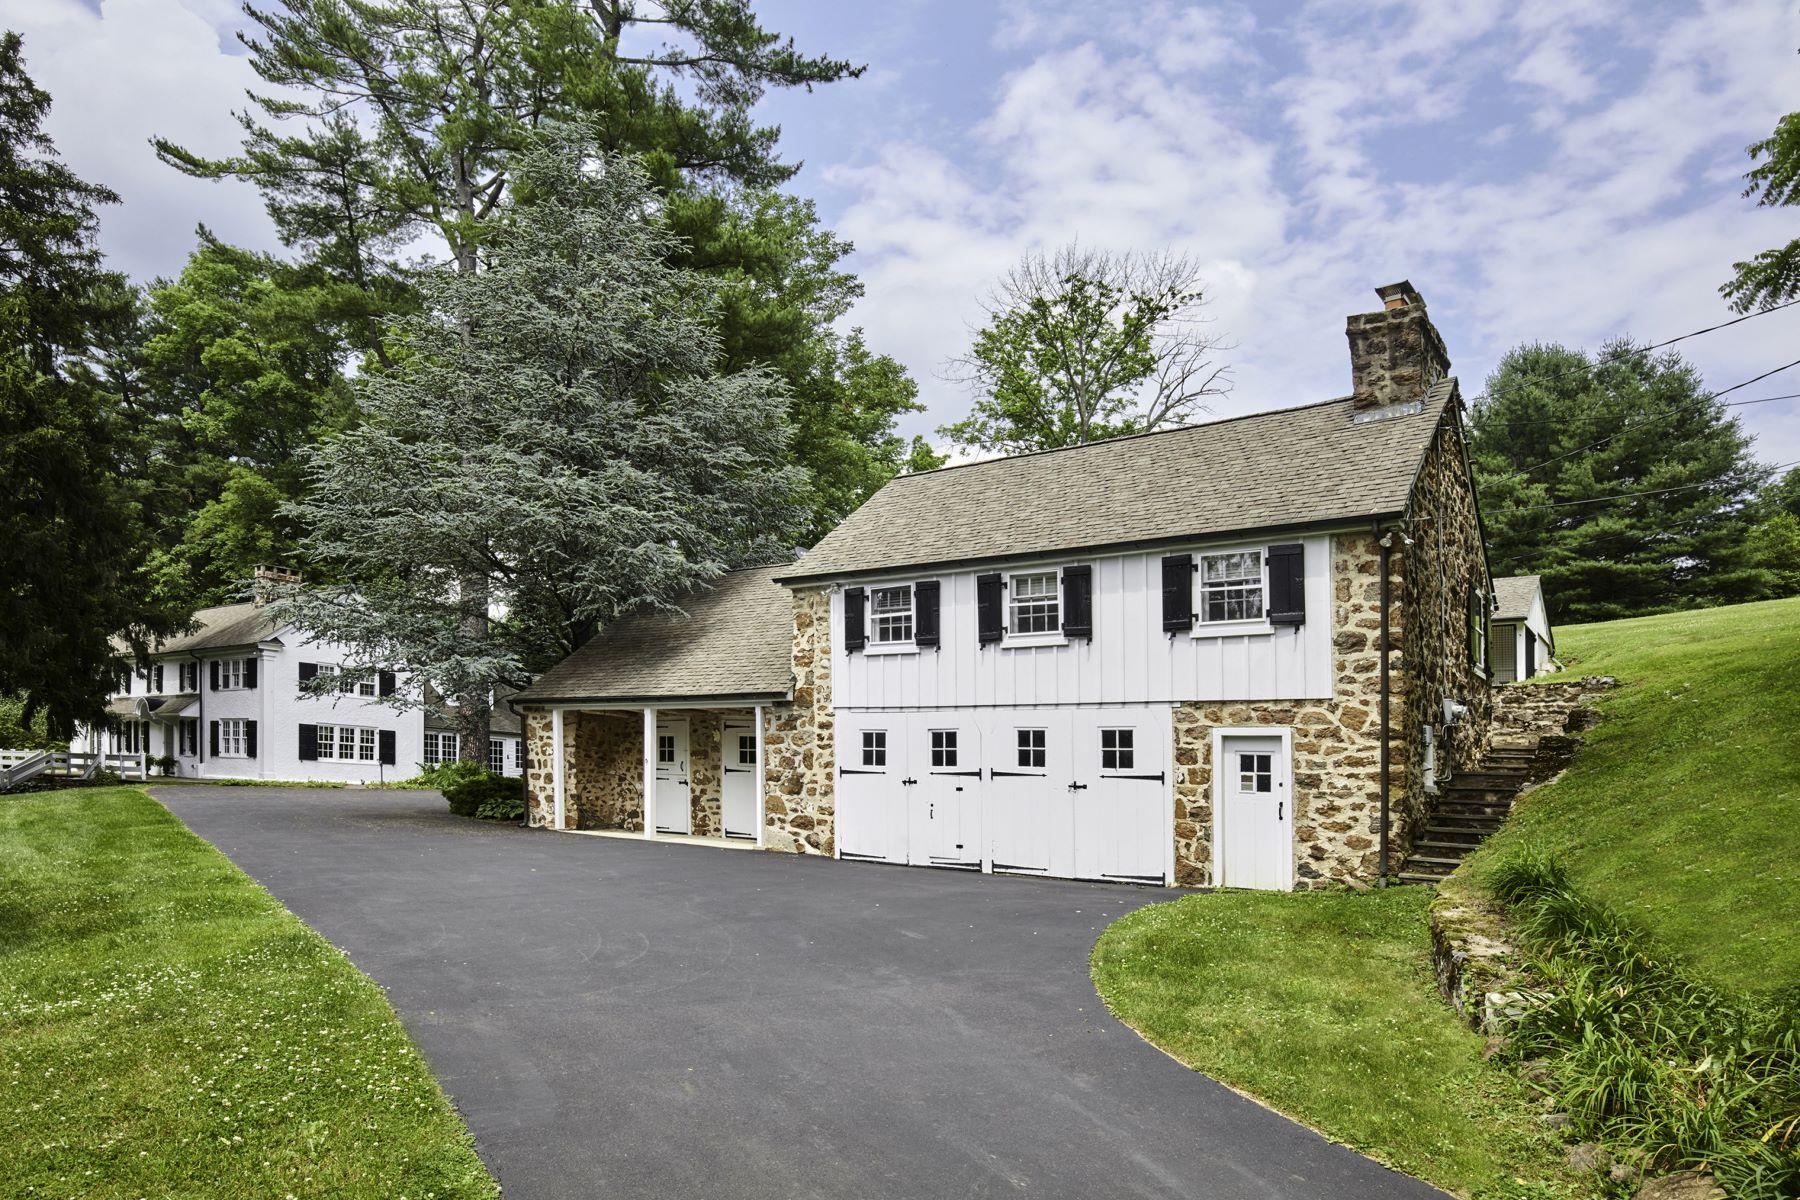 Casa Unifamiliar por un Venta en Fabulous Restored Residence 2424 GRUBBS MILL RD, Berwyn, Pennsylvania, 19312 Estados Unidos